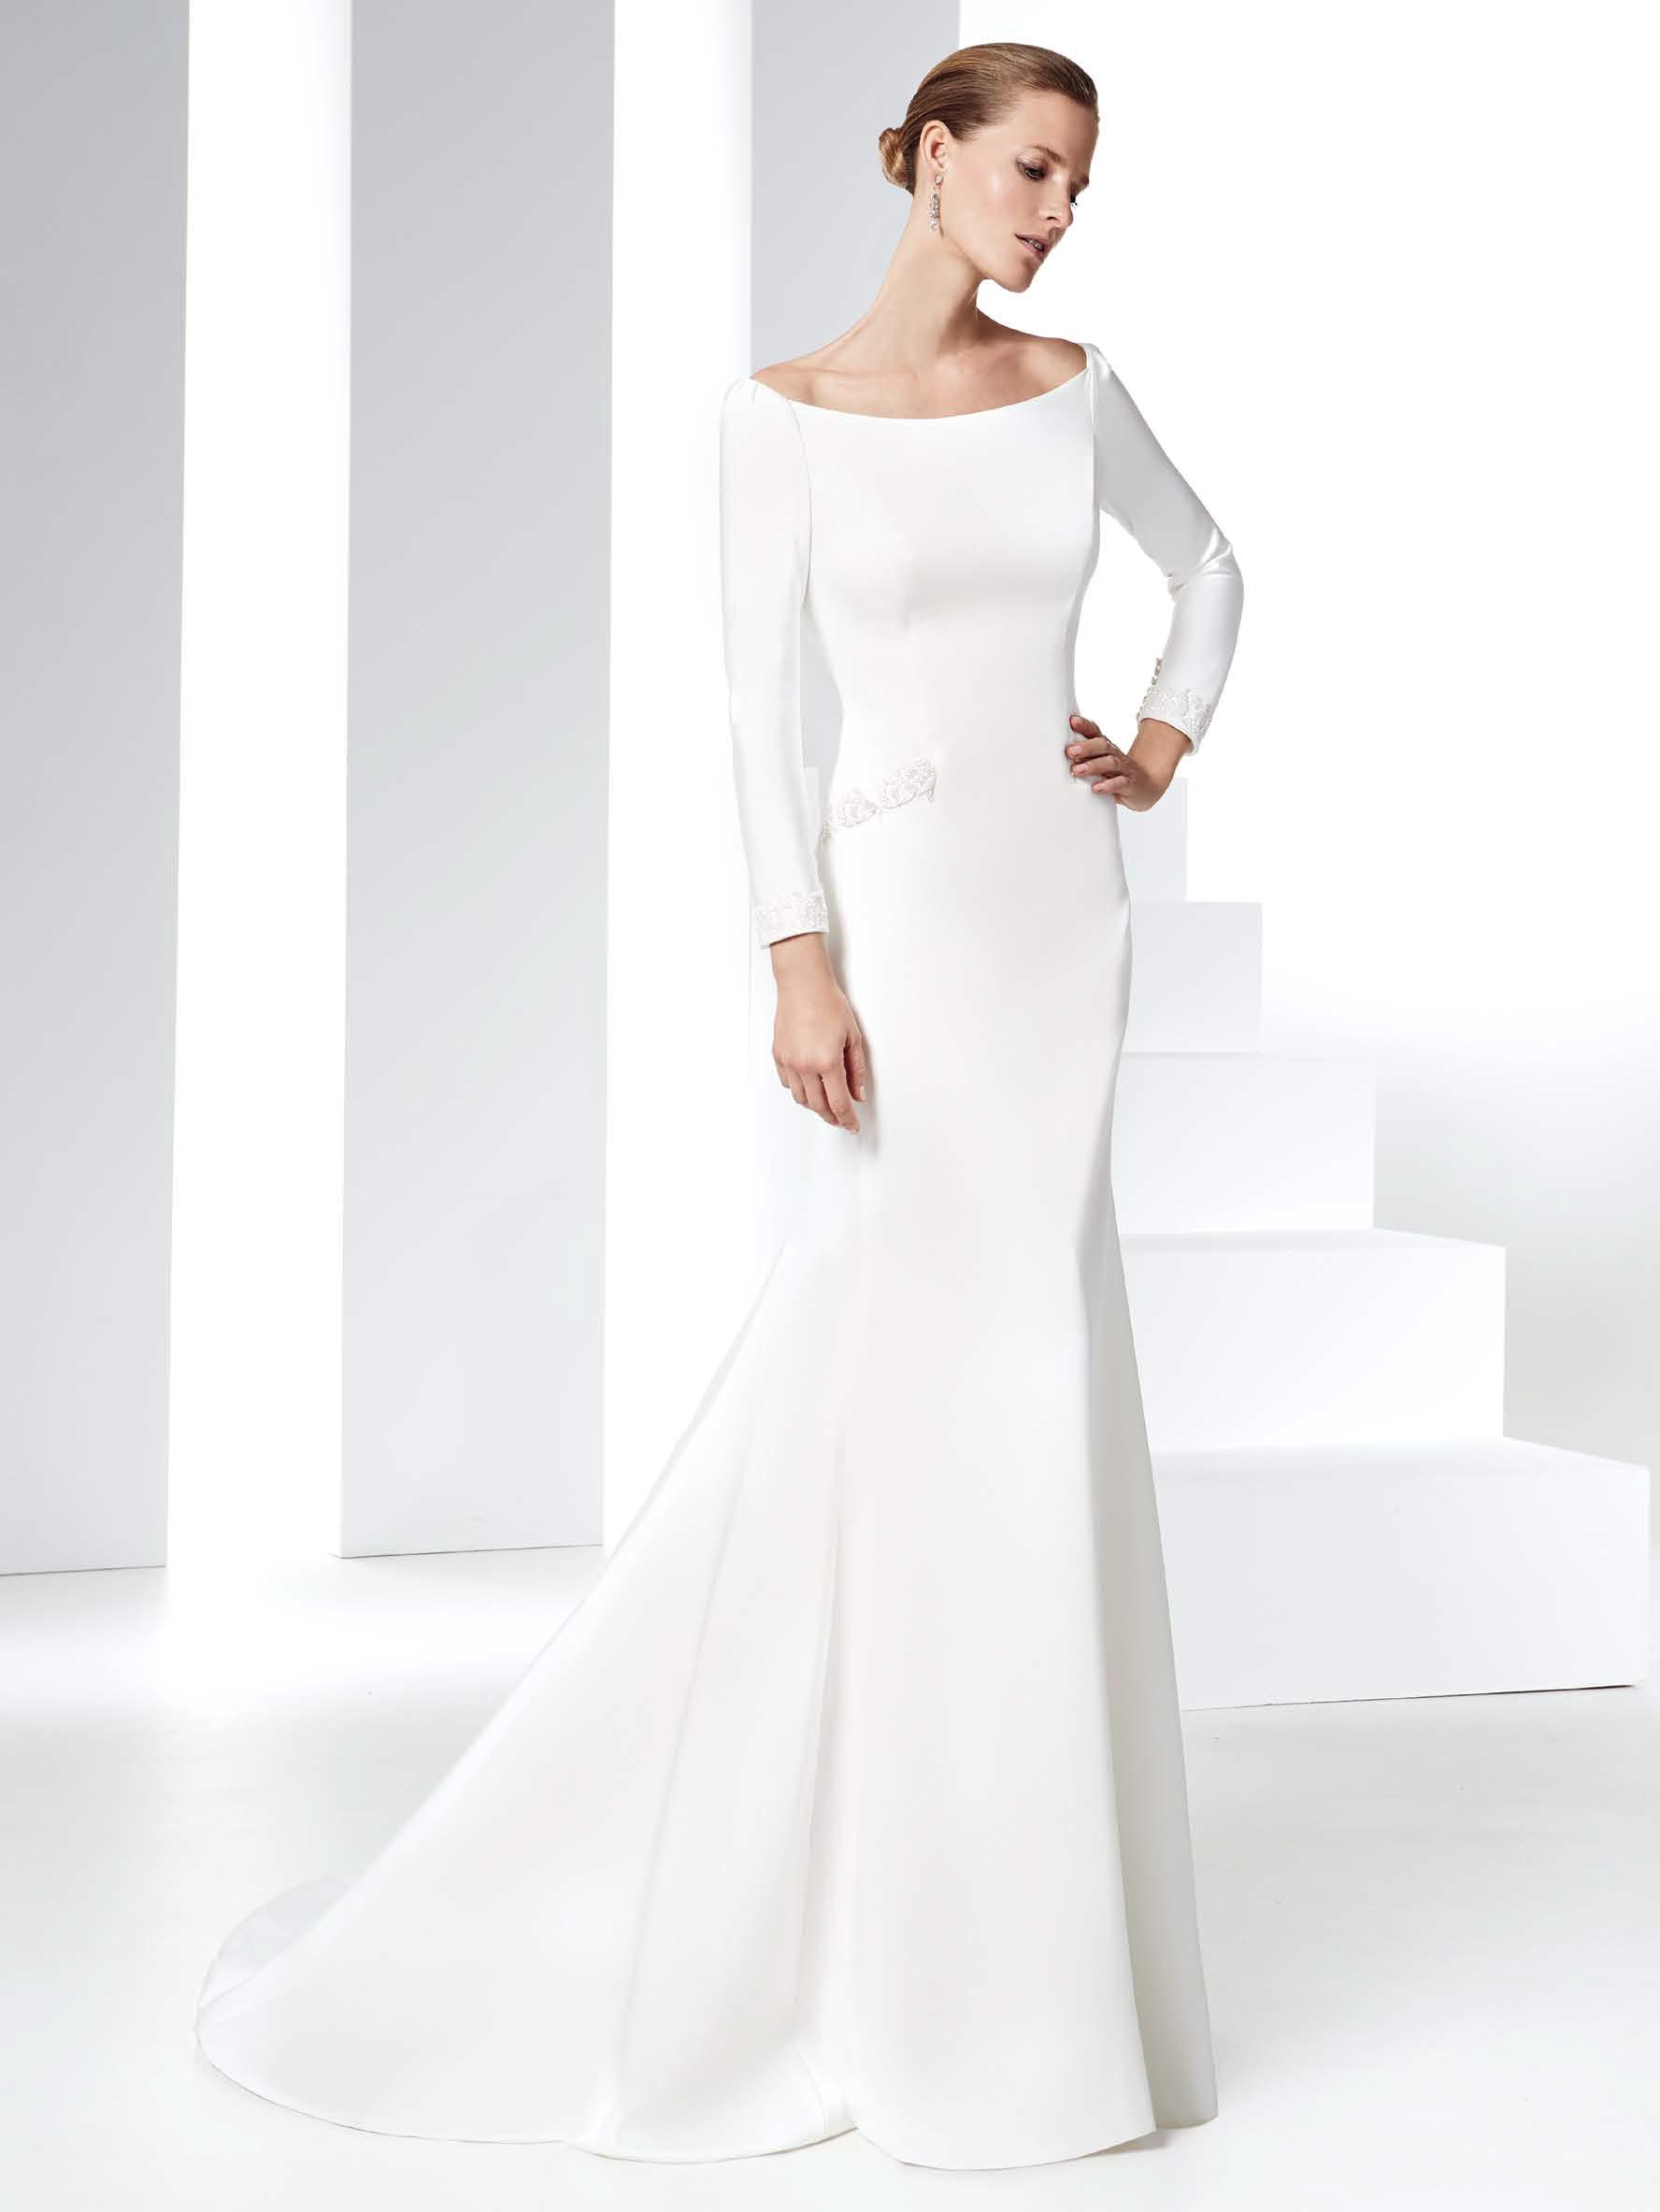 c6c238554307 Vestiti sposa inverno 2016 esempio Raimon Bundo